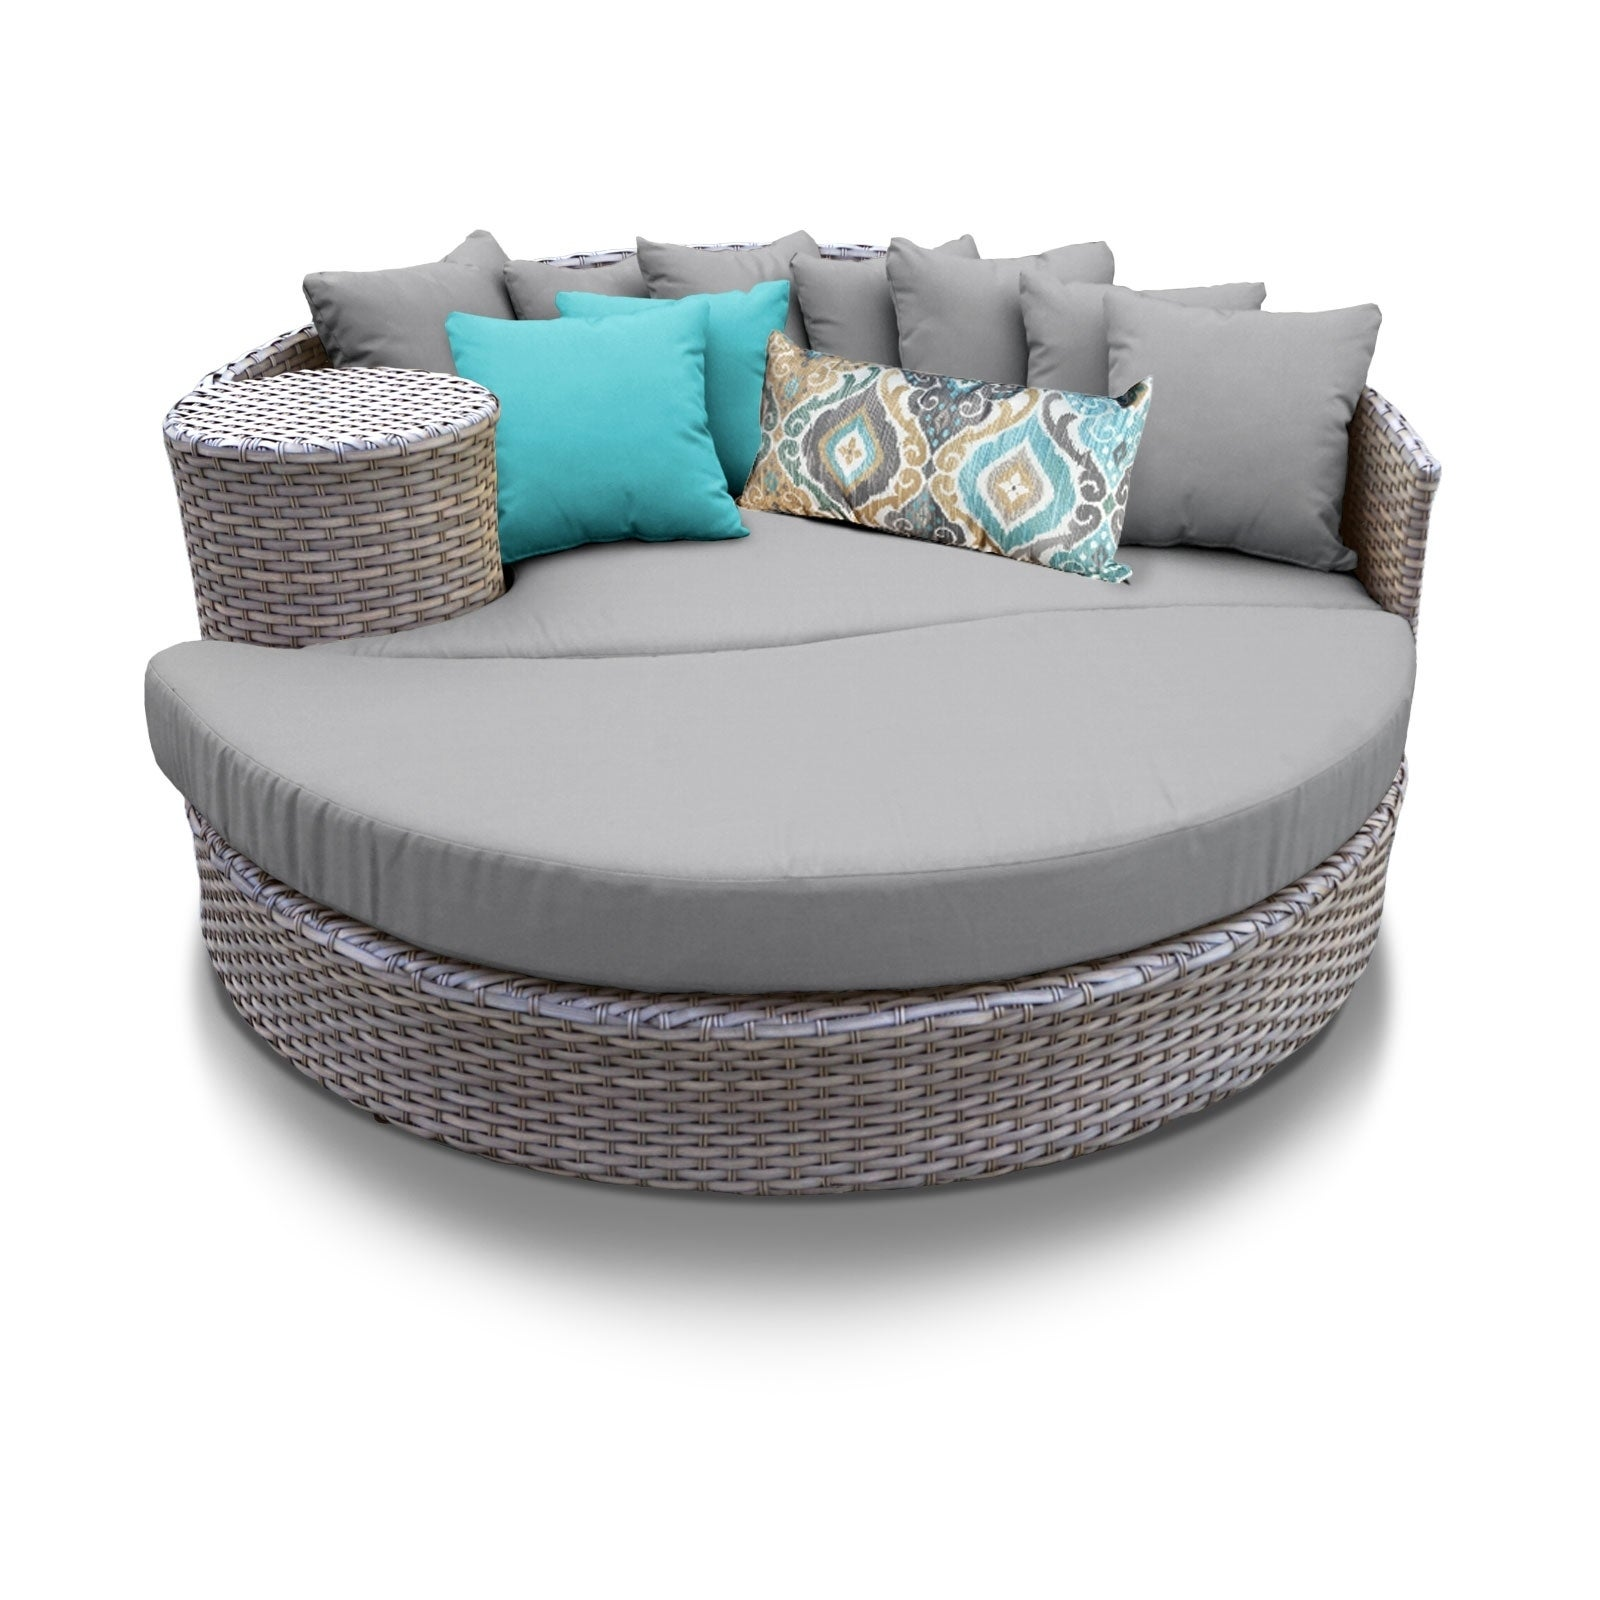 Oasis Circular Sun Bed  Outdoor Wicker Patio Furniture